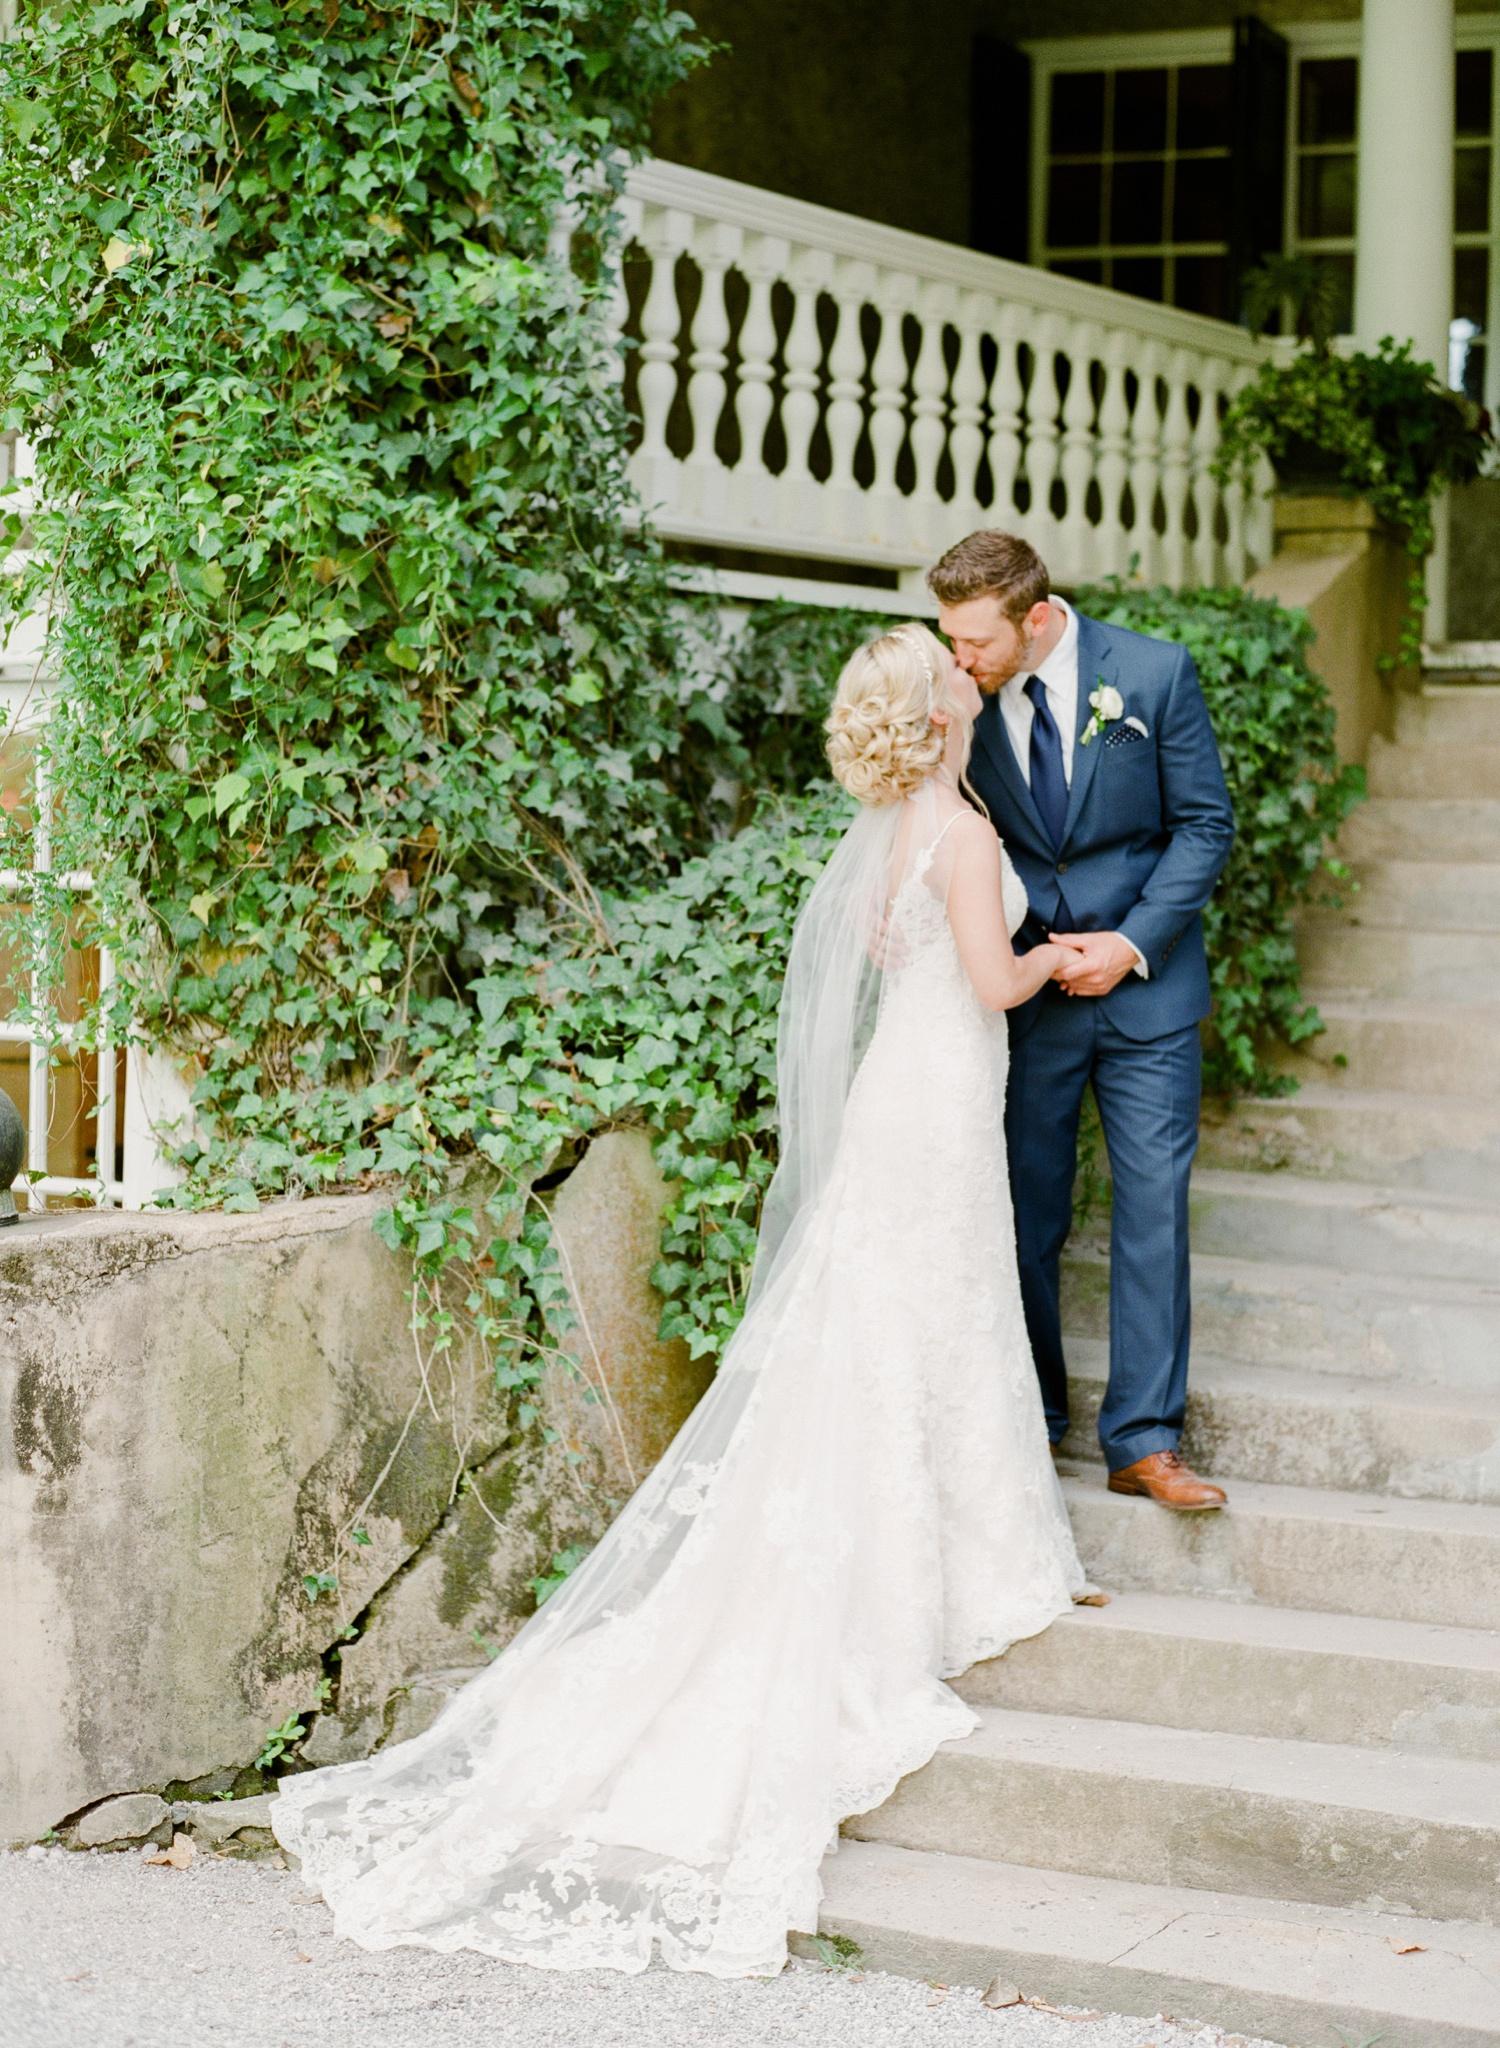 Magnolia-Garden-Southern-Weddings-Magazine_0017.jpg